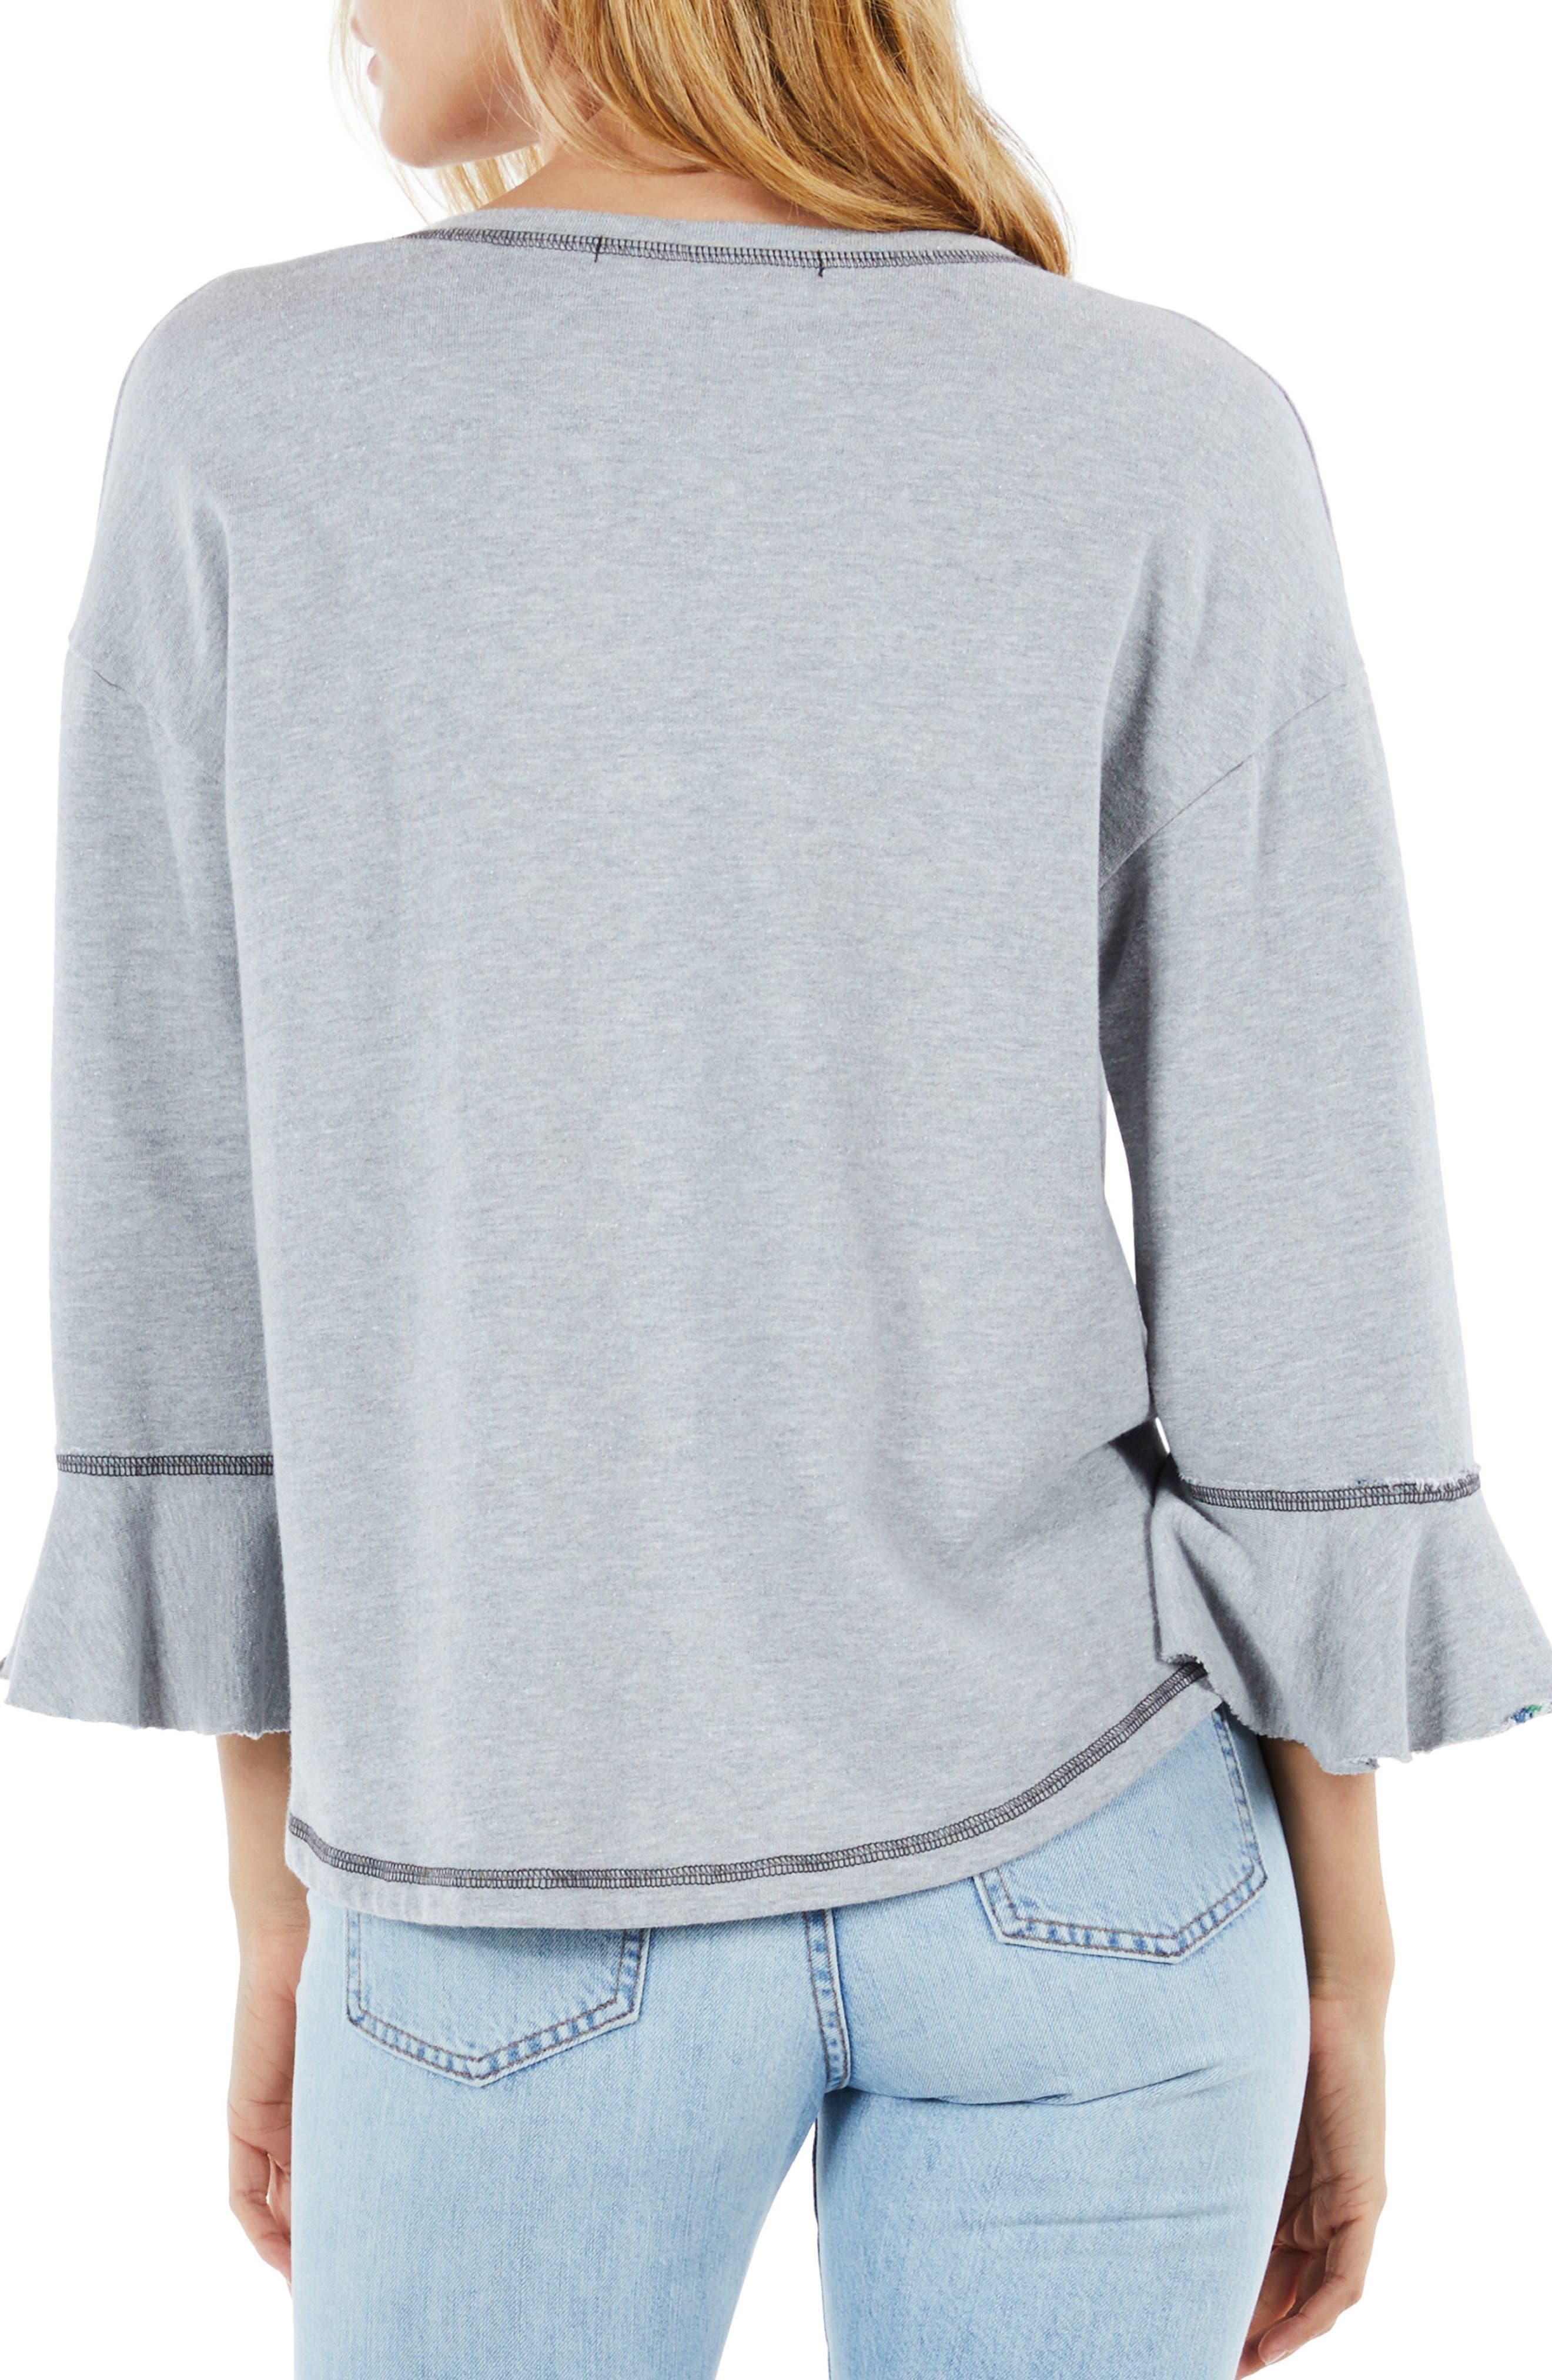 Ruffle Sleeve Reversible Sweatshirt,                             Alternate thumbnail 3, color,                             Heather Grey